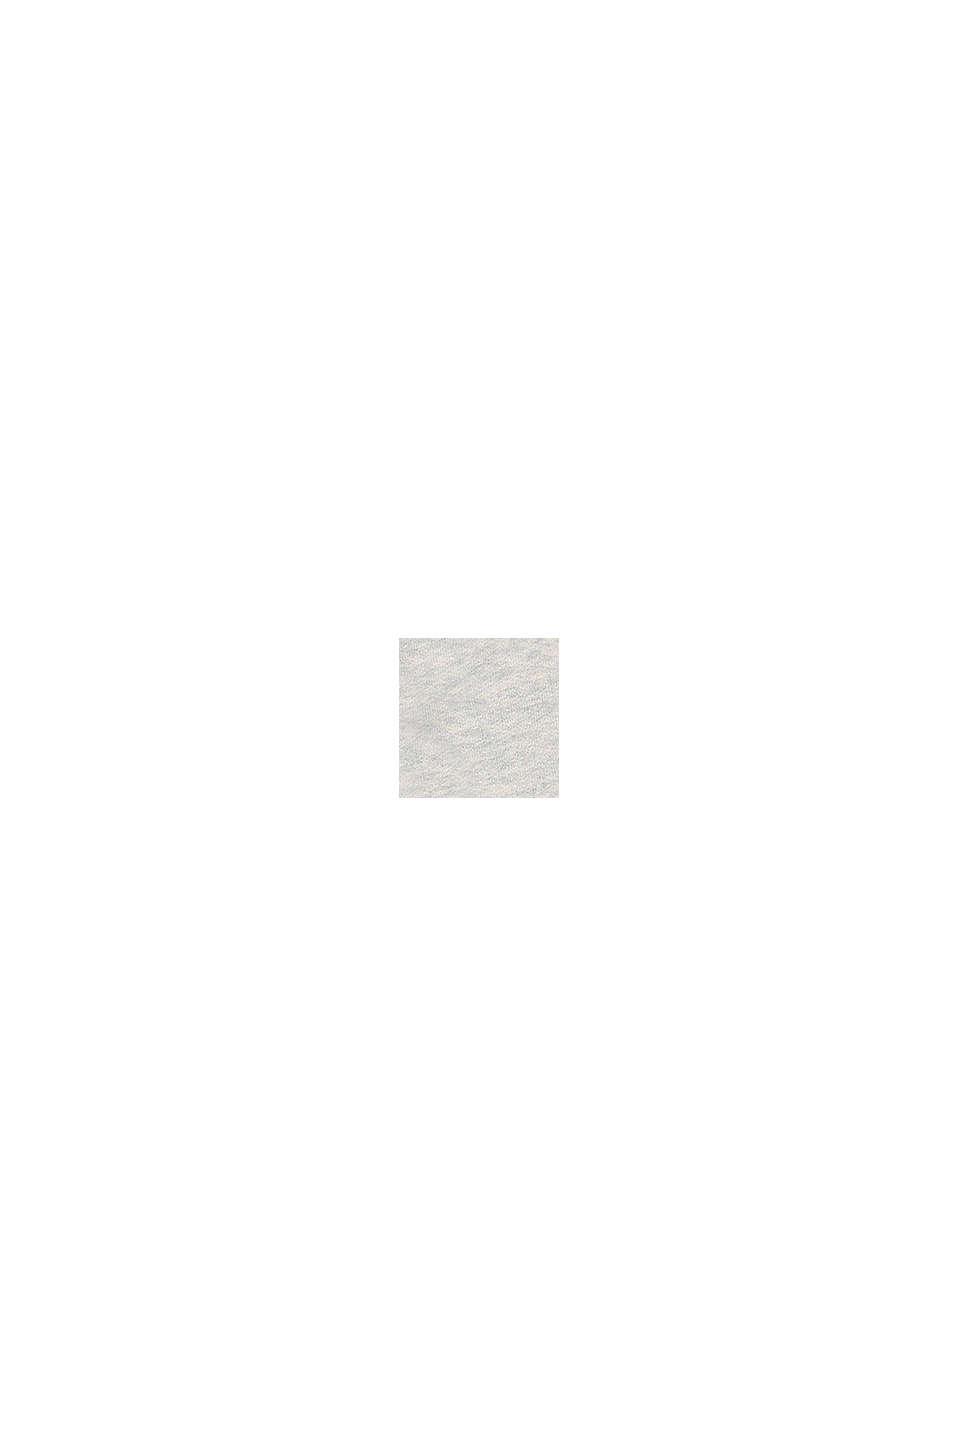 Pantalon molletonné chiné 100% coton, SILVER, swatch